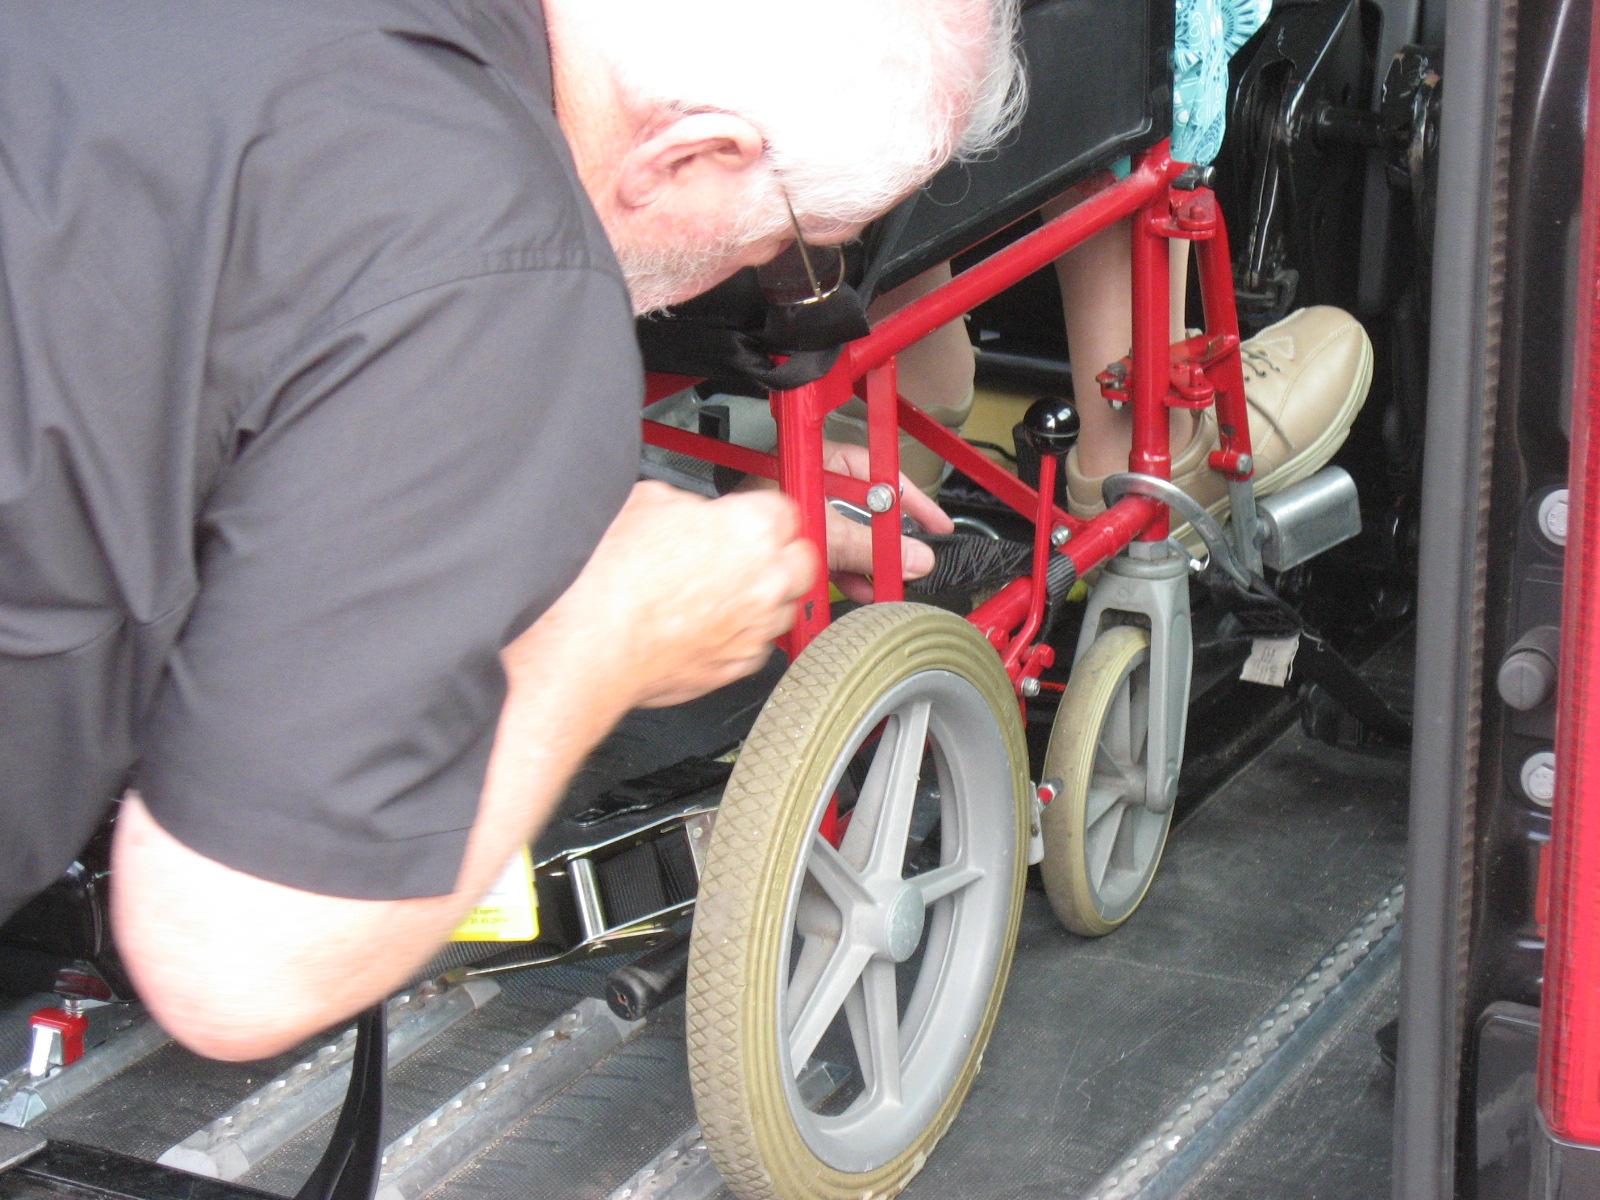 cig bins and wheelchair pics 028